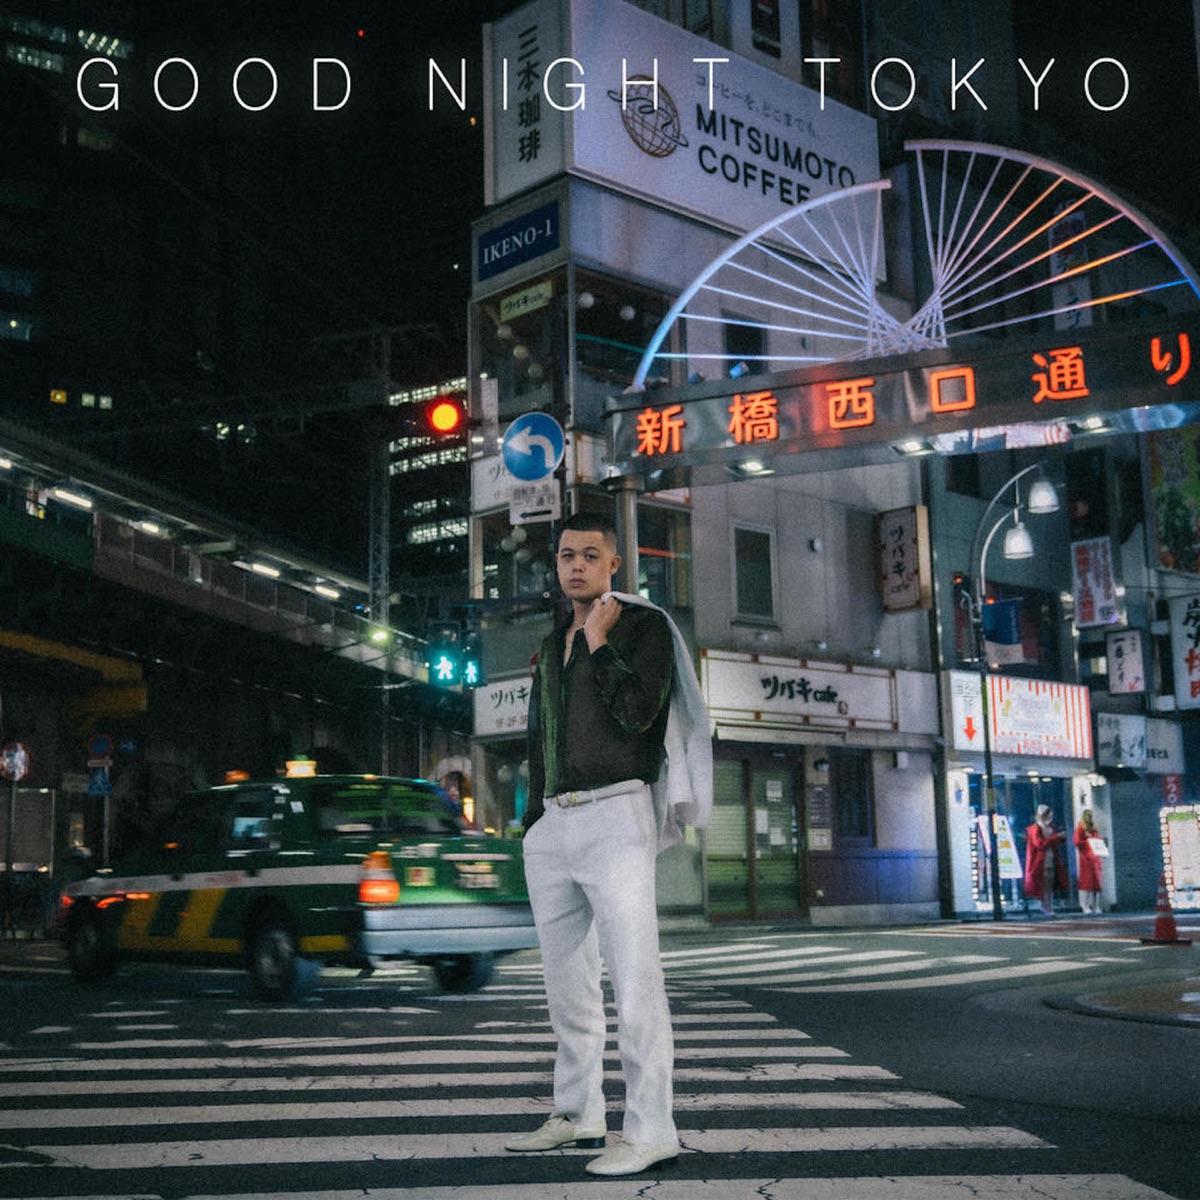 『MIYACHI & 青山テルマ - CRAZY OUTSIDE』収録の『GOOD NIGHT TOKYO』ジャケット